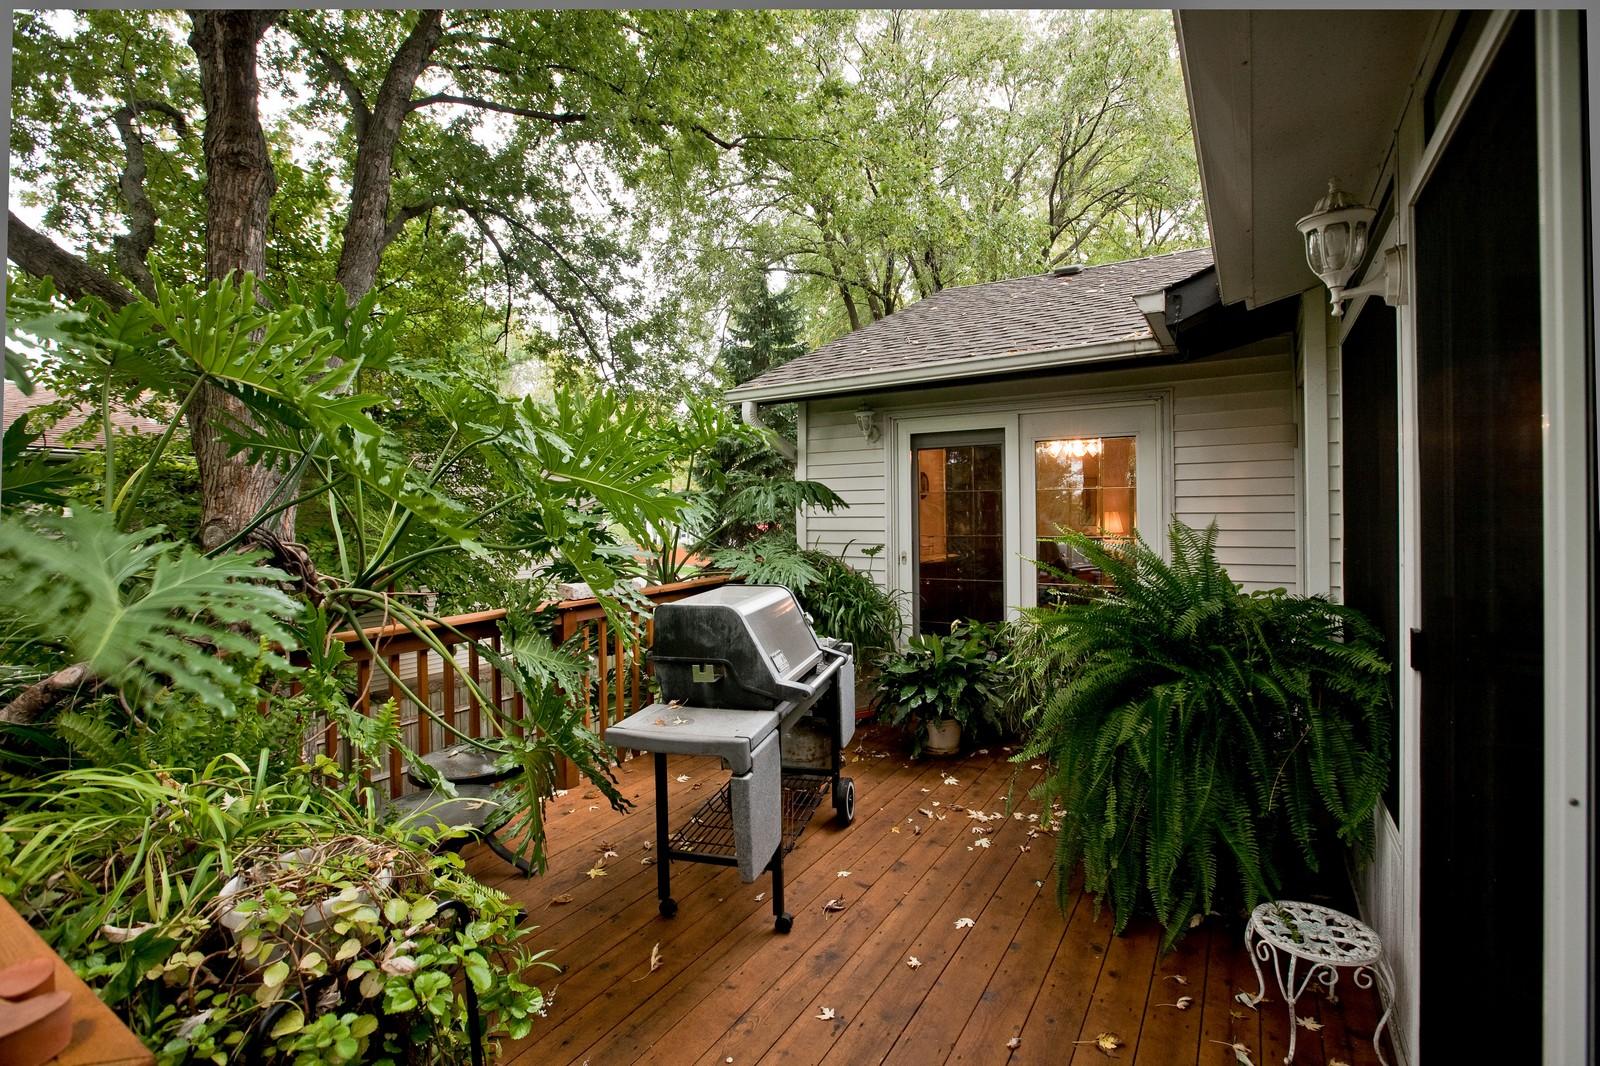 Real Estate Photography - 4402 Black Partridge, Lisle, IL, 60532 - Deck